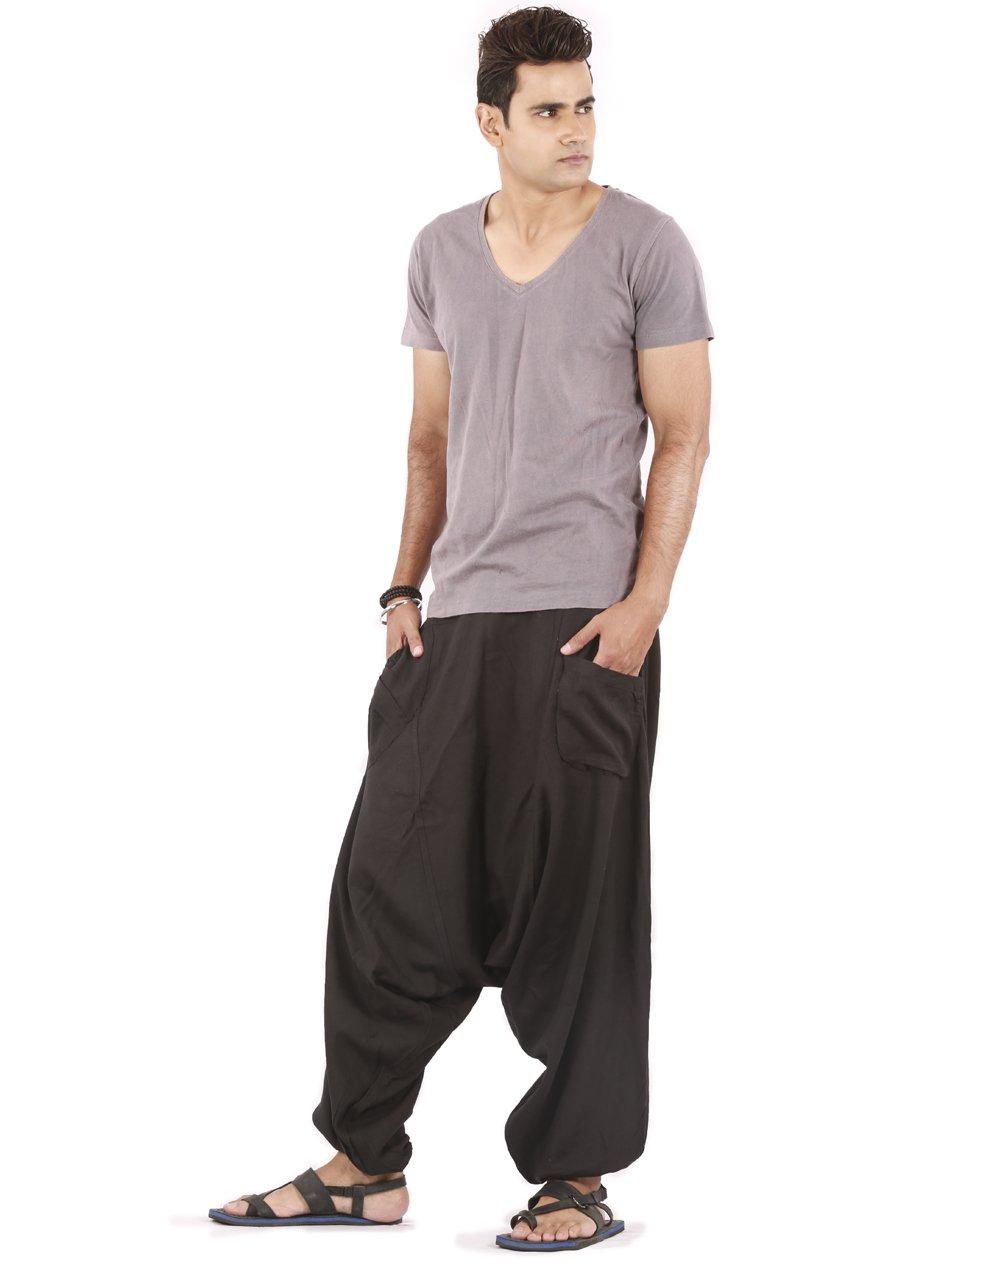 Mens Linen Pants - Drop Pockets Style (Black)